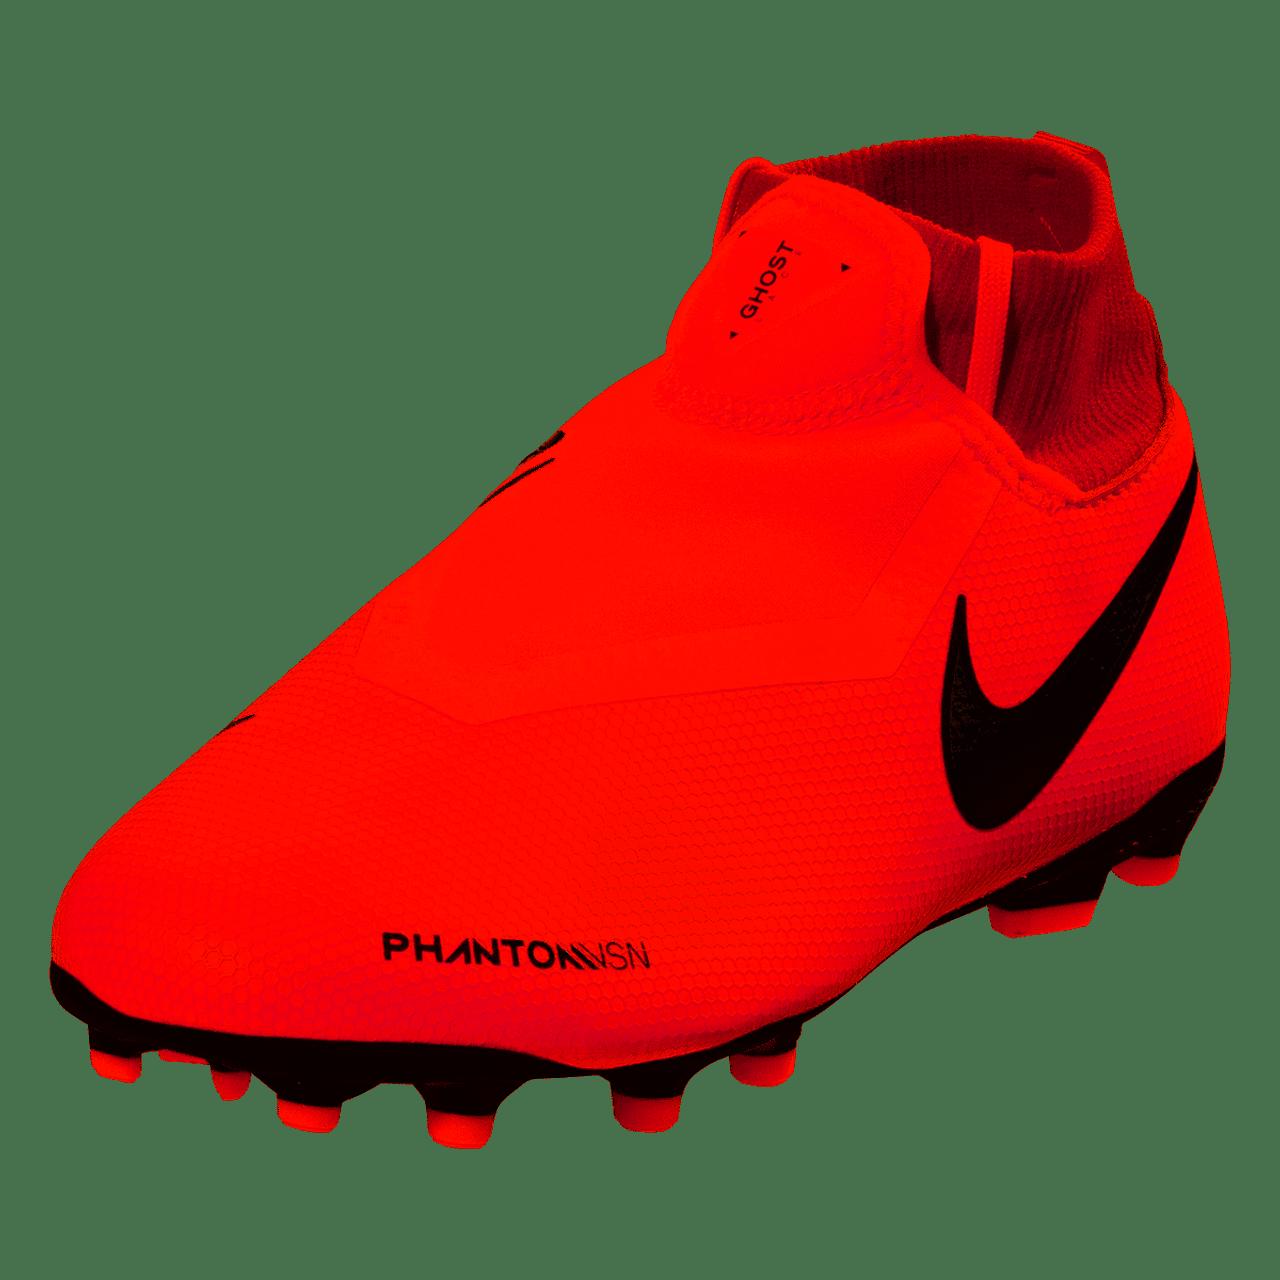 Nike Jr Phantom VSN Academy DF FG MG - Bright Crimson Metallic Silver  (011019) - ohp soccer 20e113954b